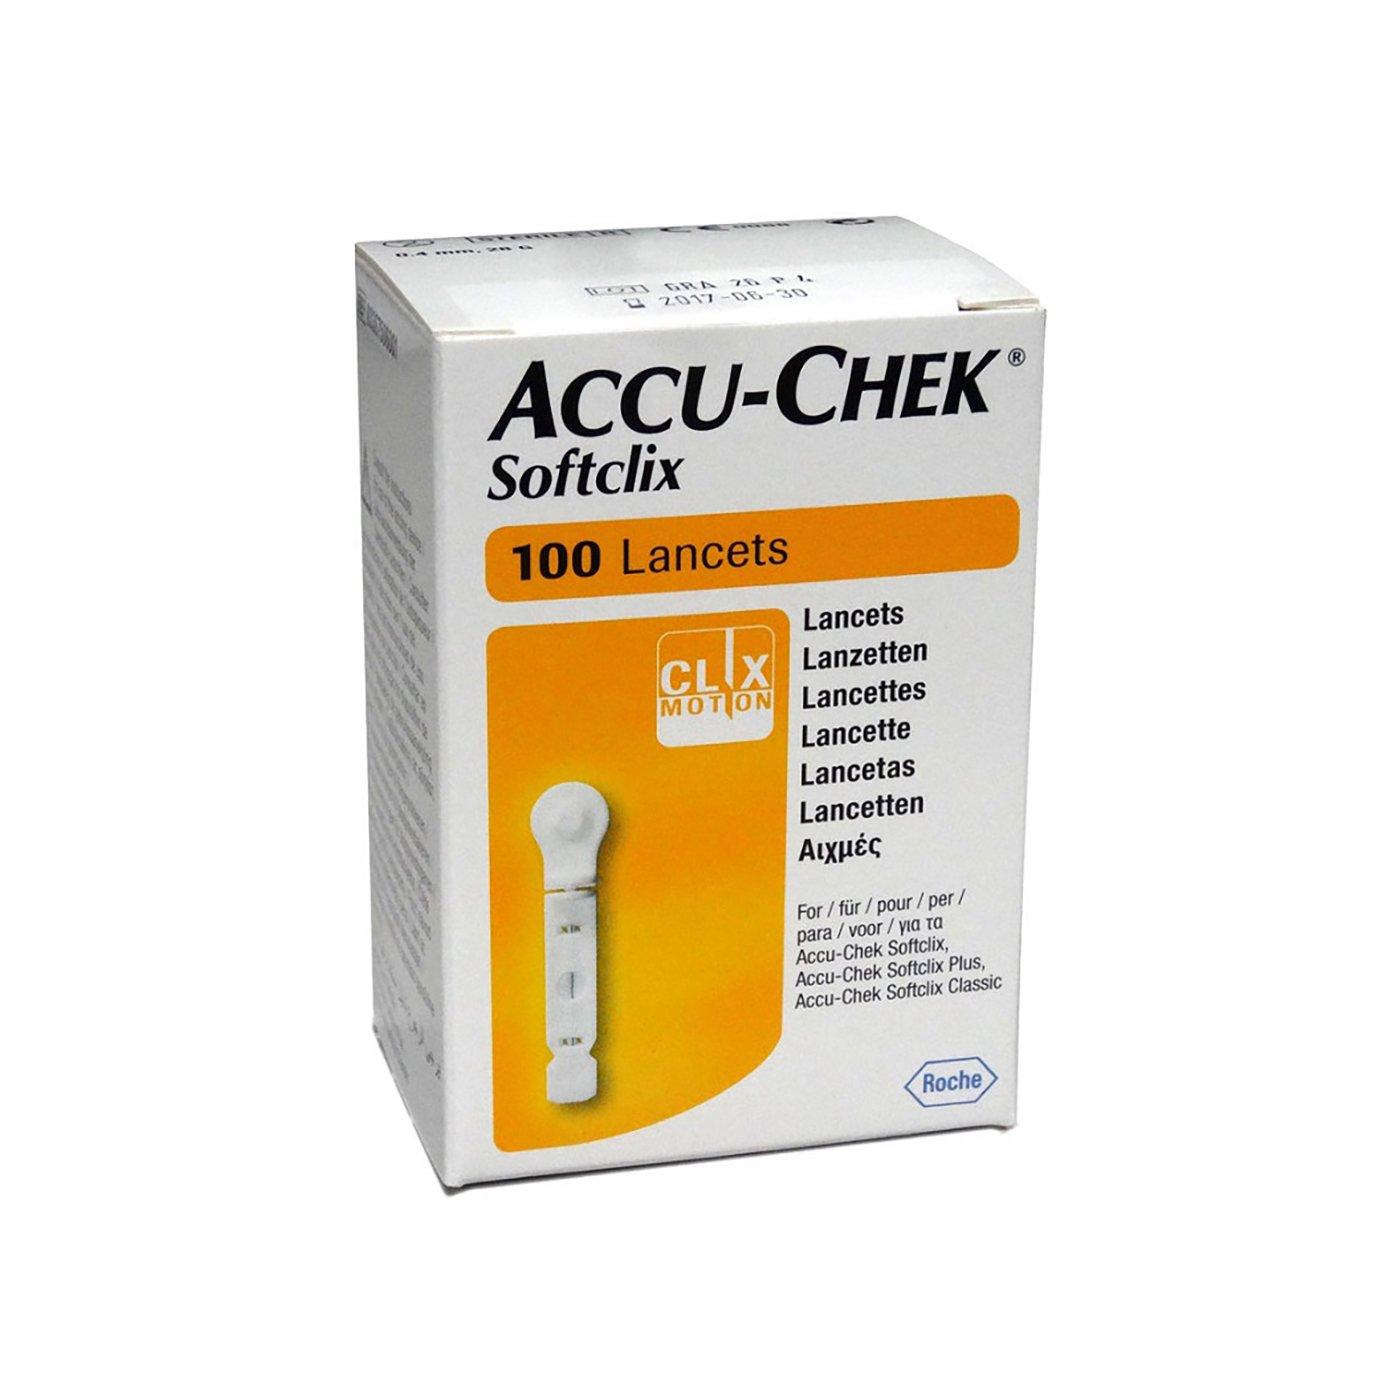 Accu-Chek Softclix Lancets, Box 200